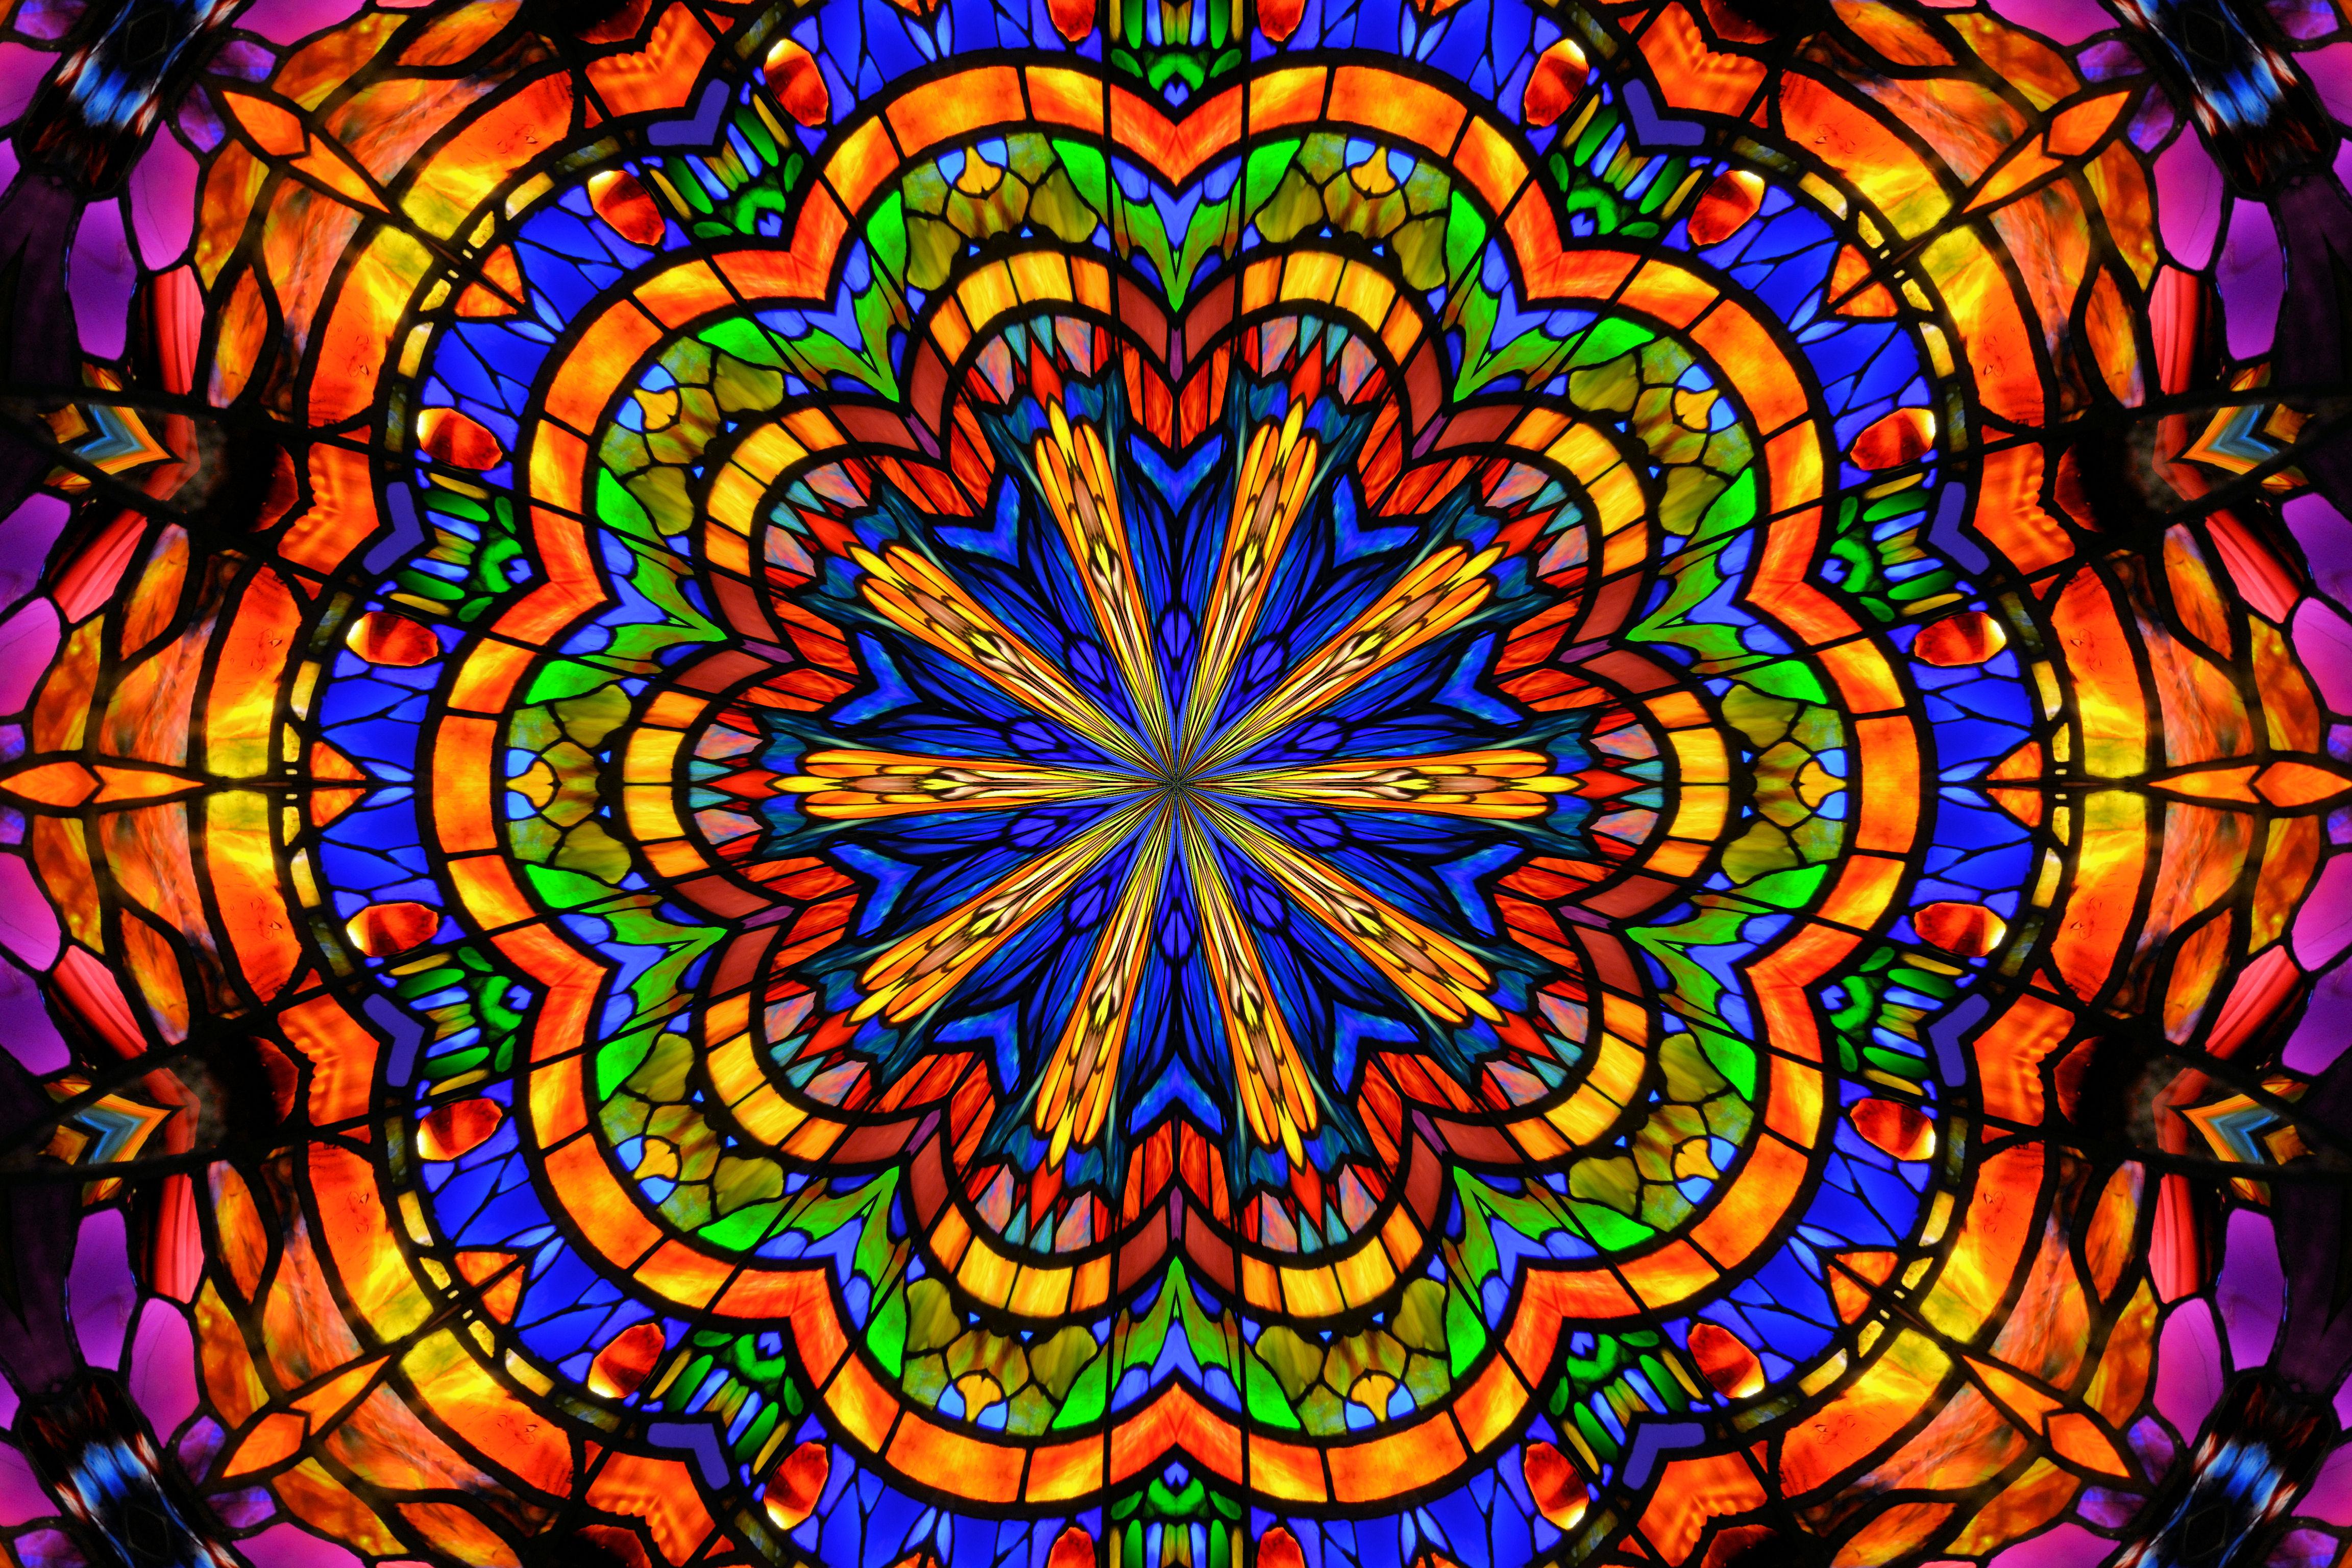 Kaleidoscope, The - Beatz'n'Pieces